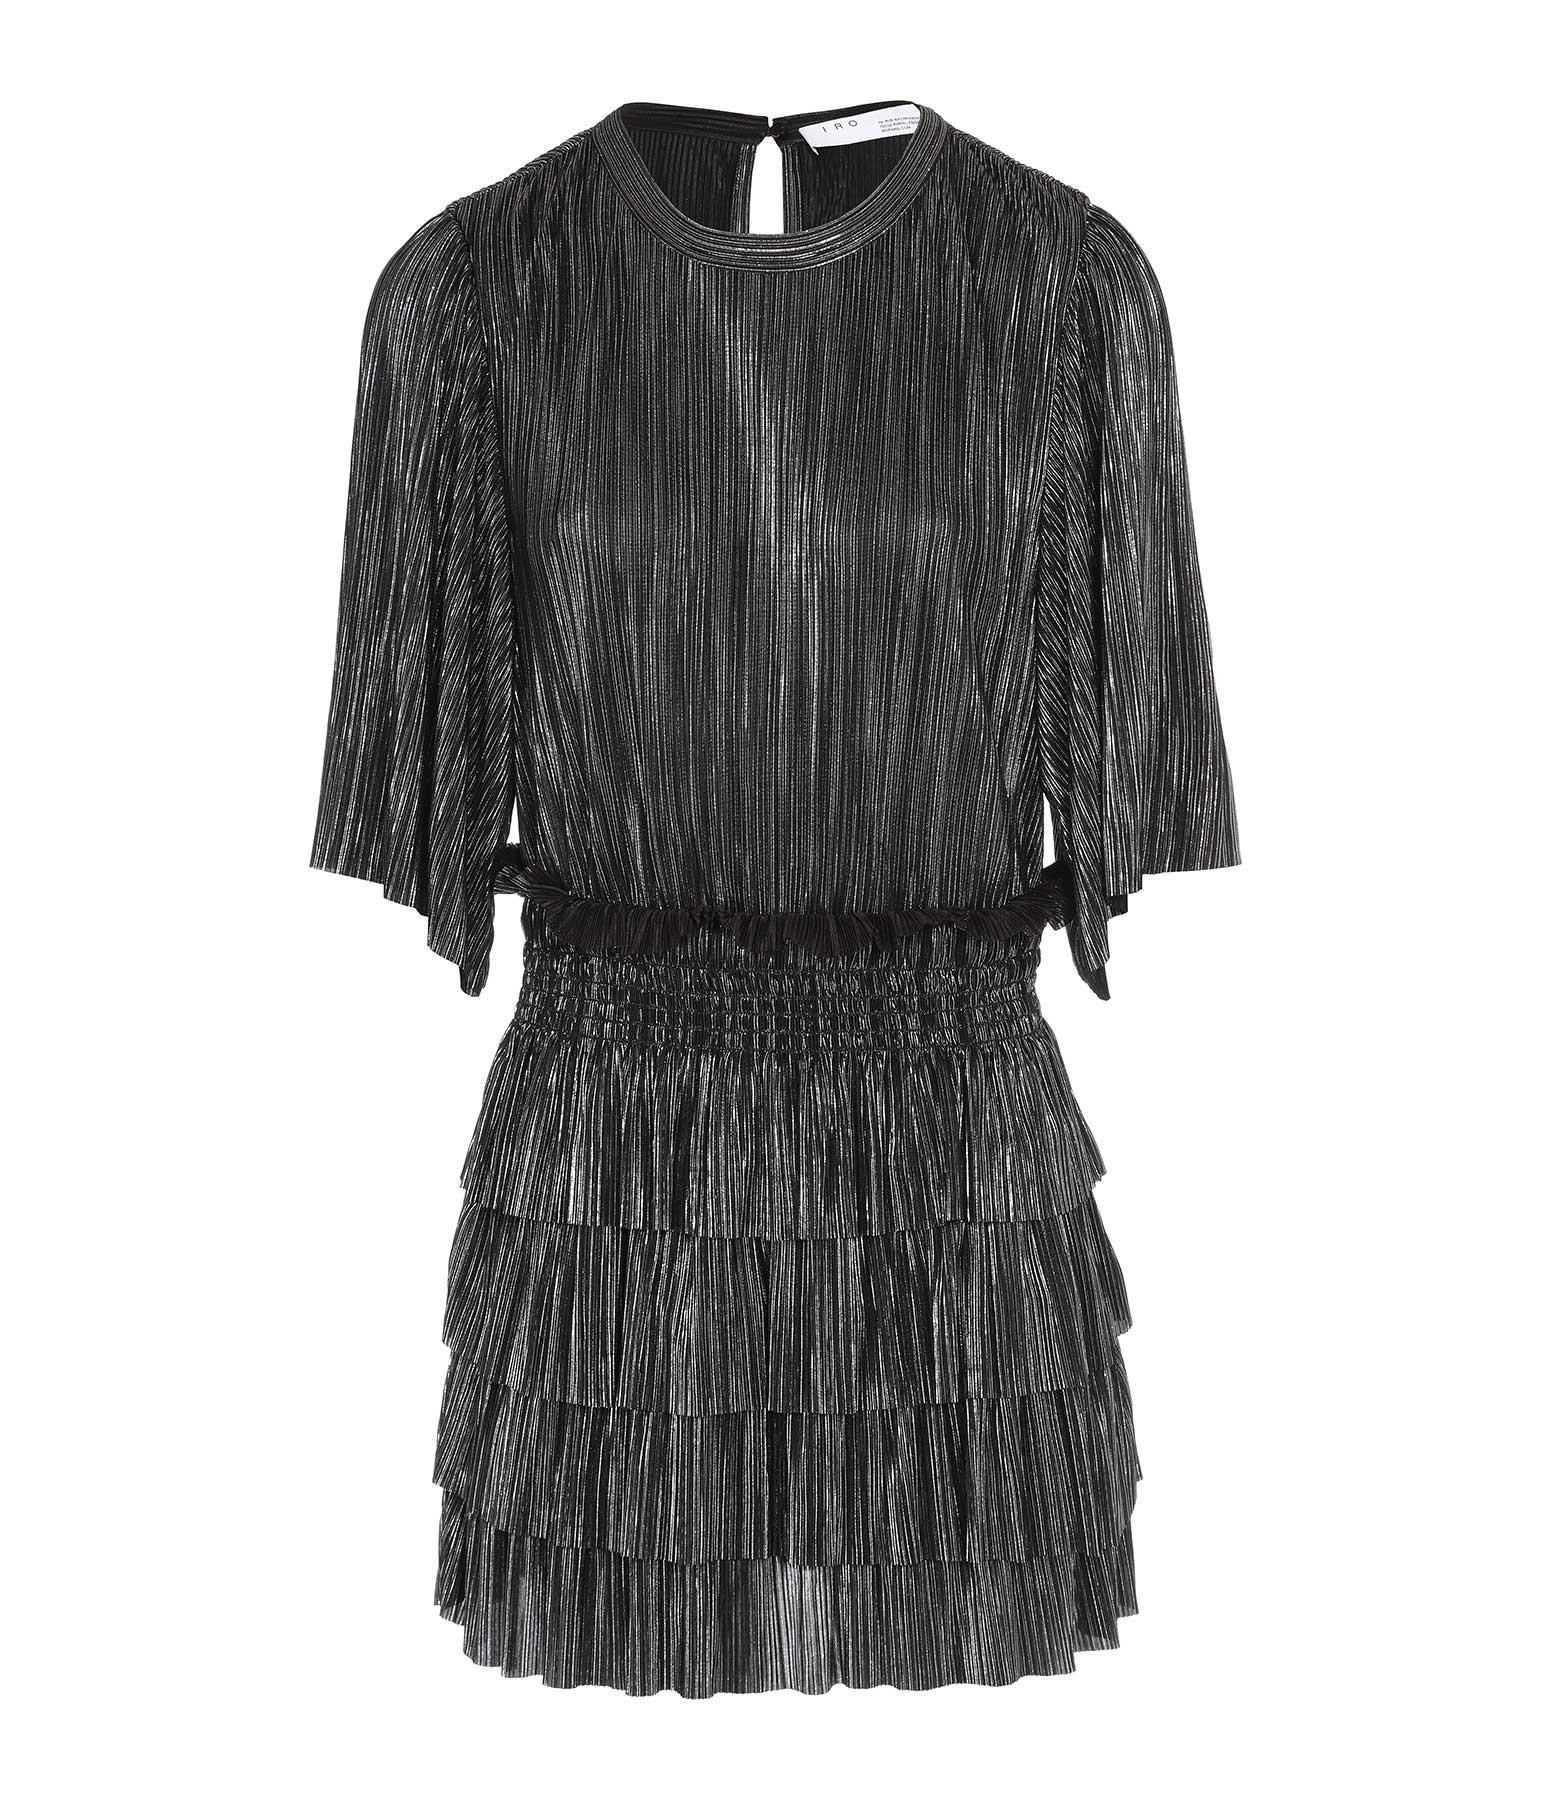 IRO - Robe Cuzco Noir Argenté